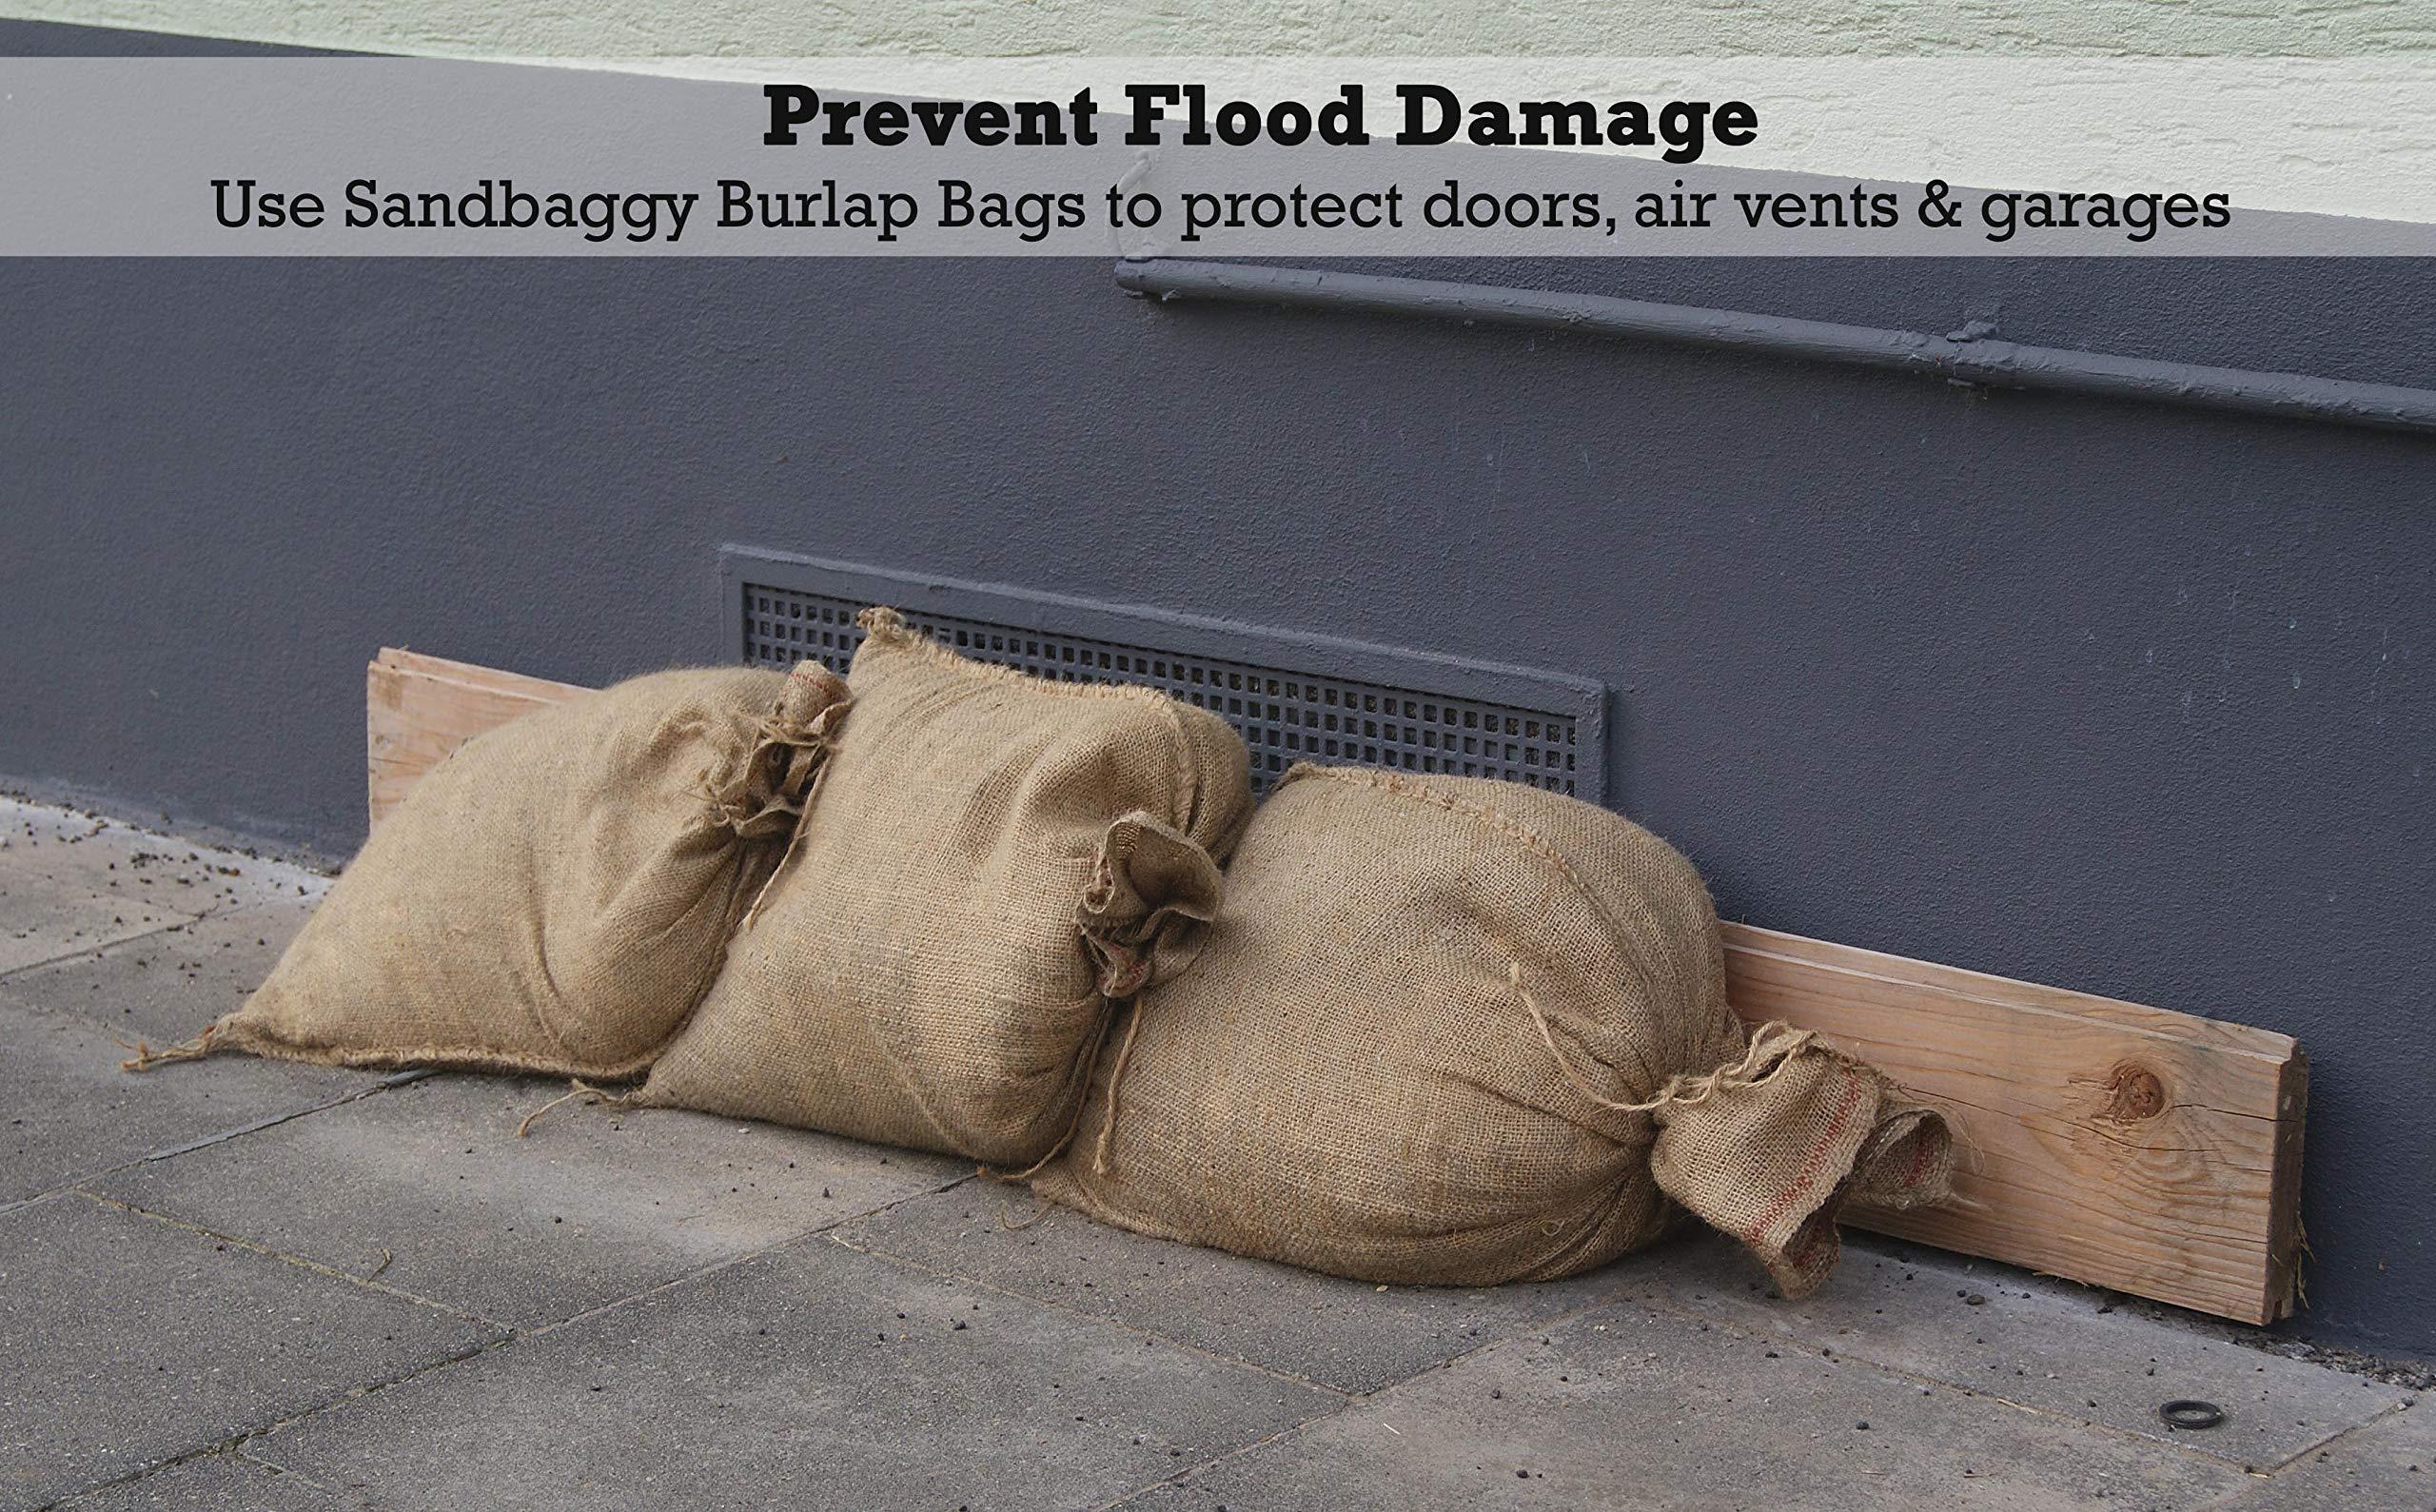 Sandbaggy Burlap Sand Bag - Size: 14'' x 26'' - Sandbags 50lb Weight Capacity - Sandbags for Flooding - Sand Bag - Flood Water Barrier - Water Curb - Tent Sandbags - Store Bags (5 Bags) by Sandbaggy (Image #4)